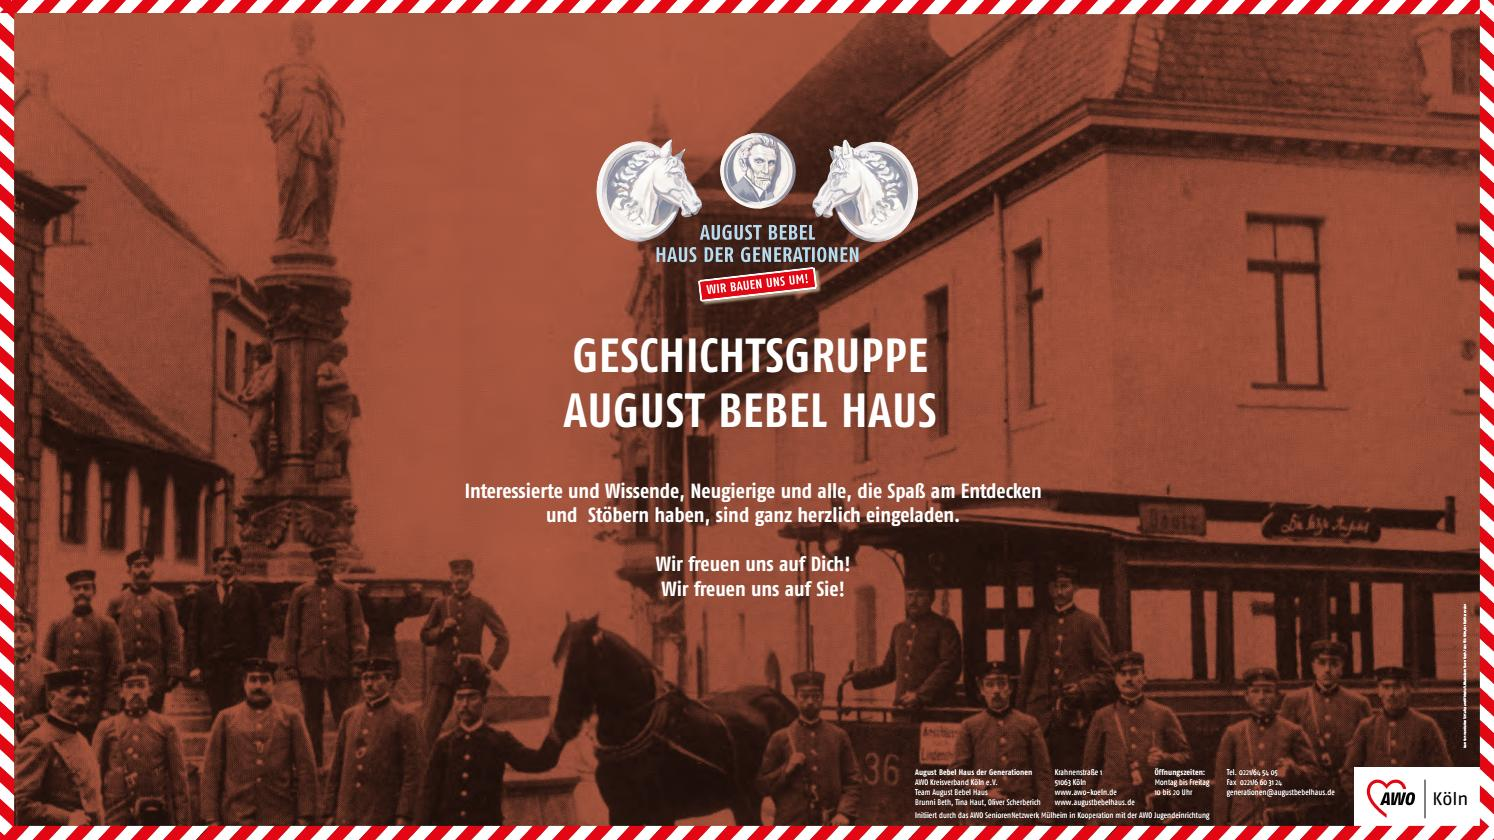 August Bebel Haus Köln Geschichte By Eva Rusch Issuu